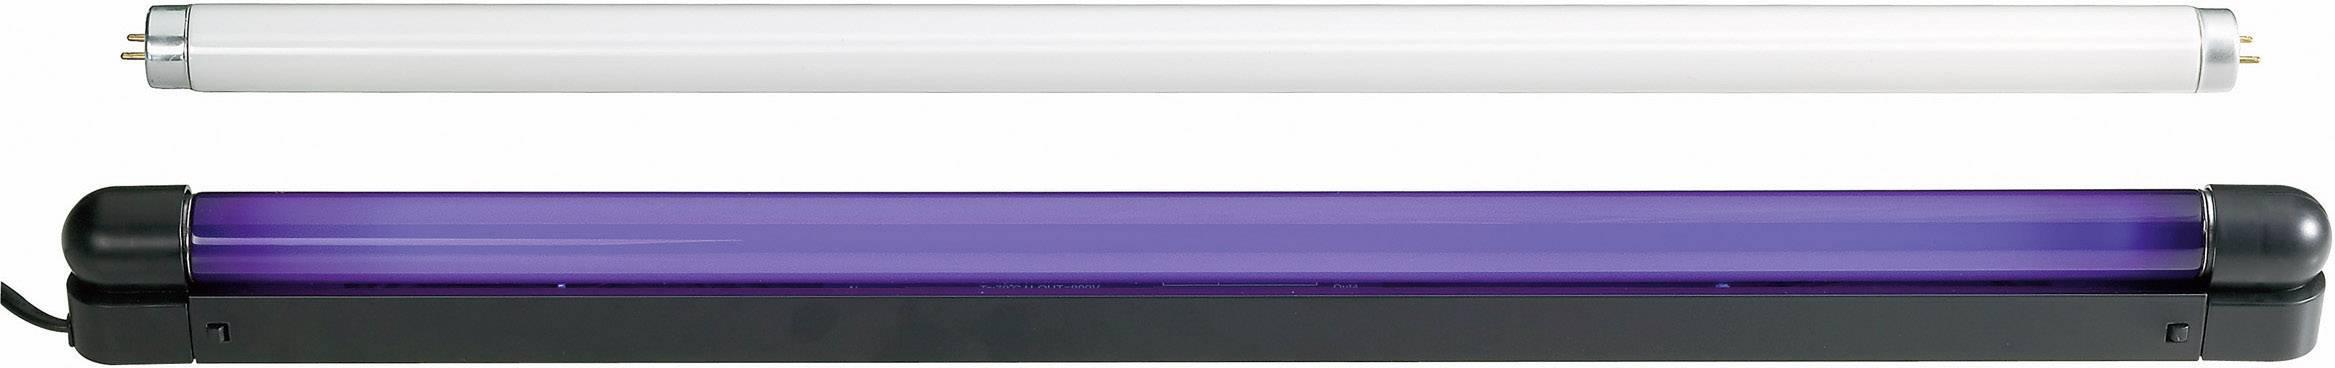 UV svietidlo so žiarivkou, sada 120cm 36W Slim UV & weiß 51101464, 120 cm, 36 W, čierna